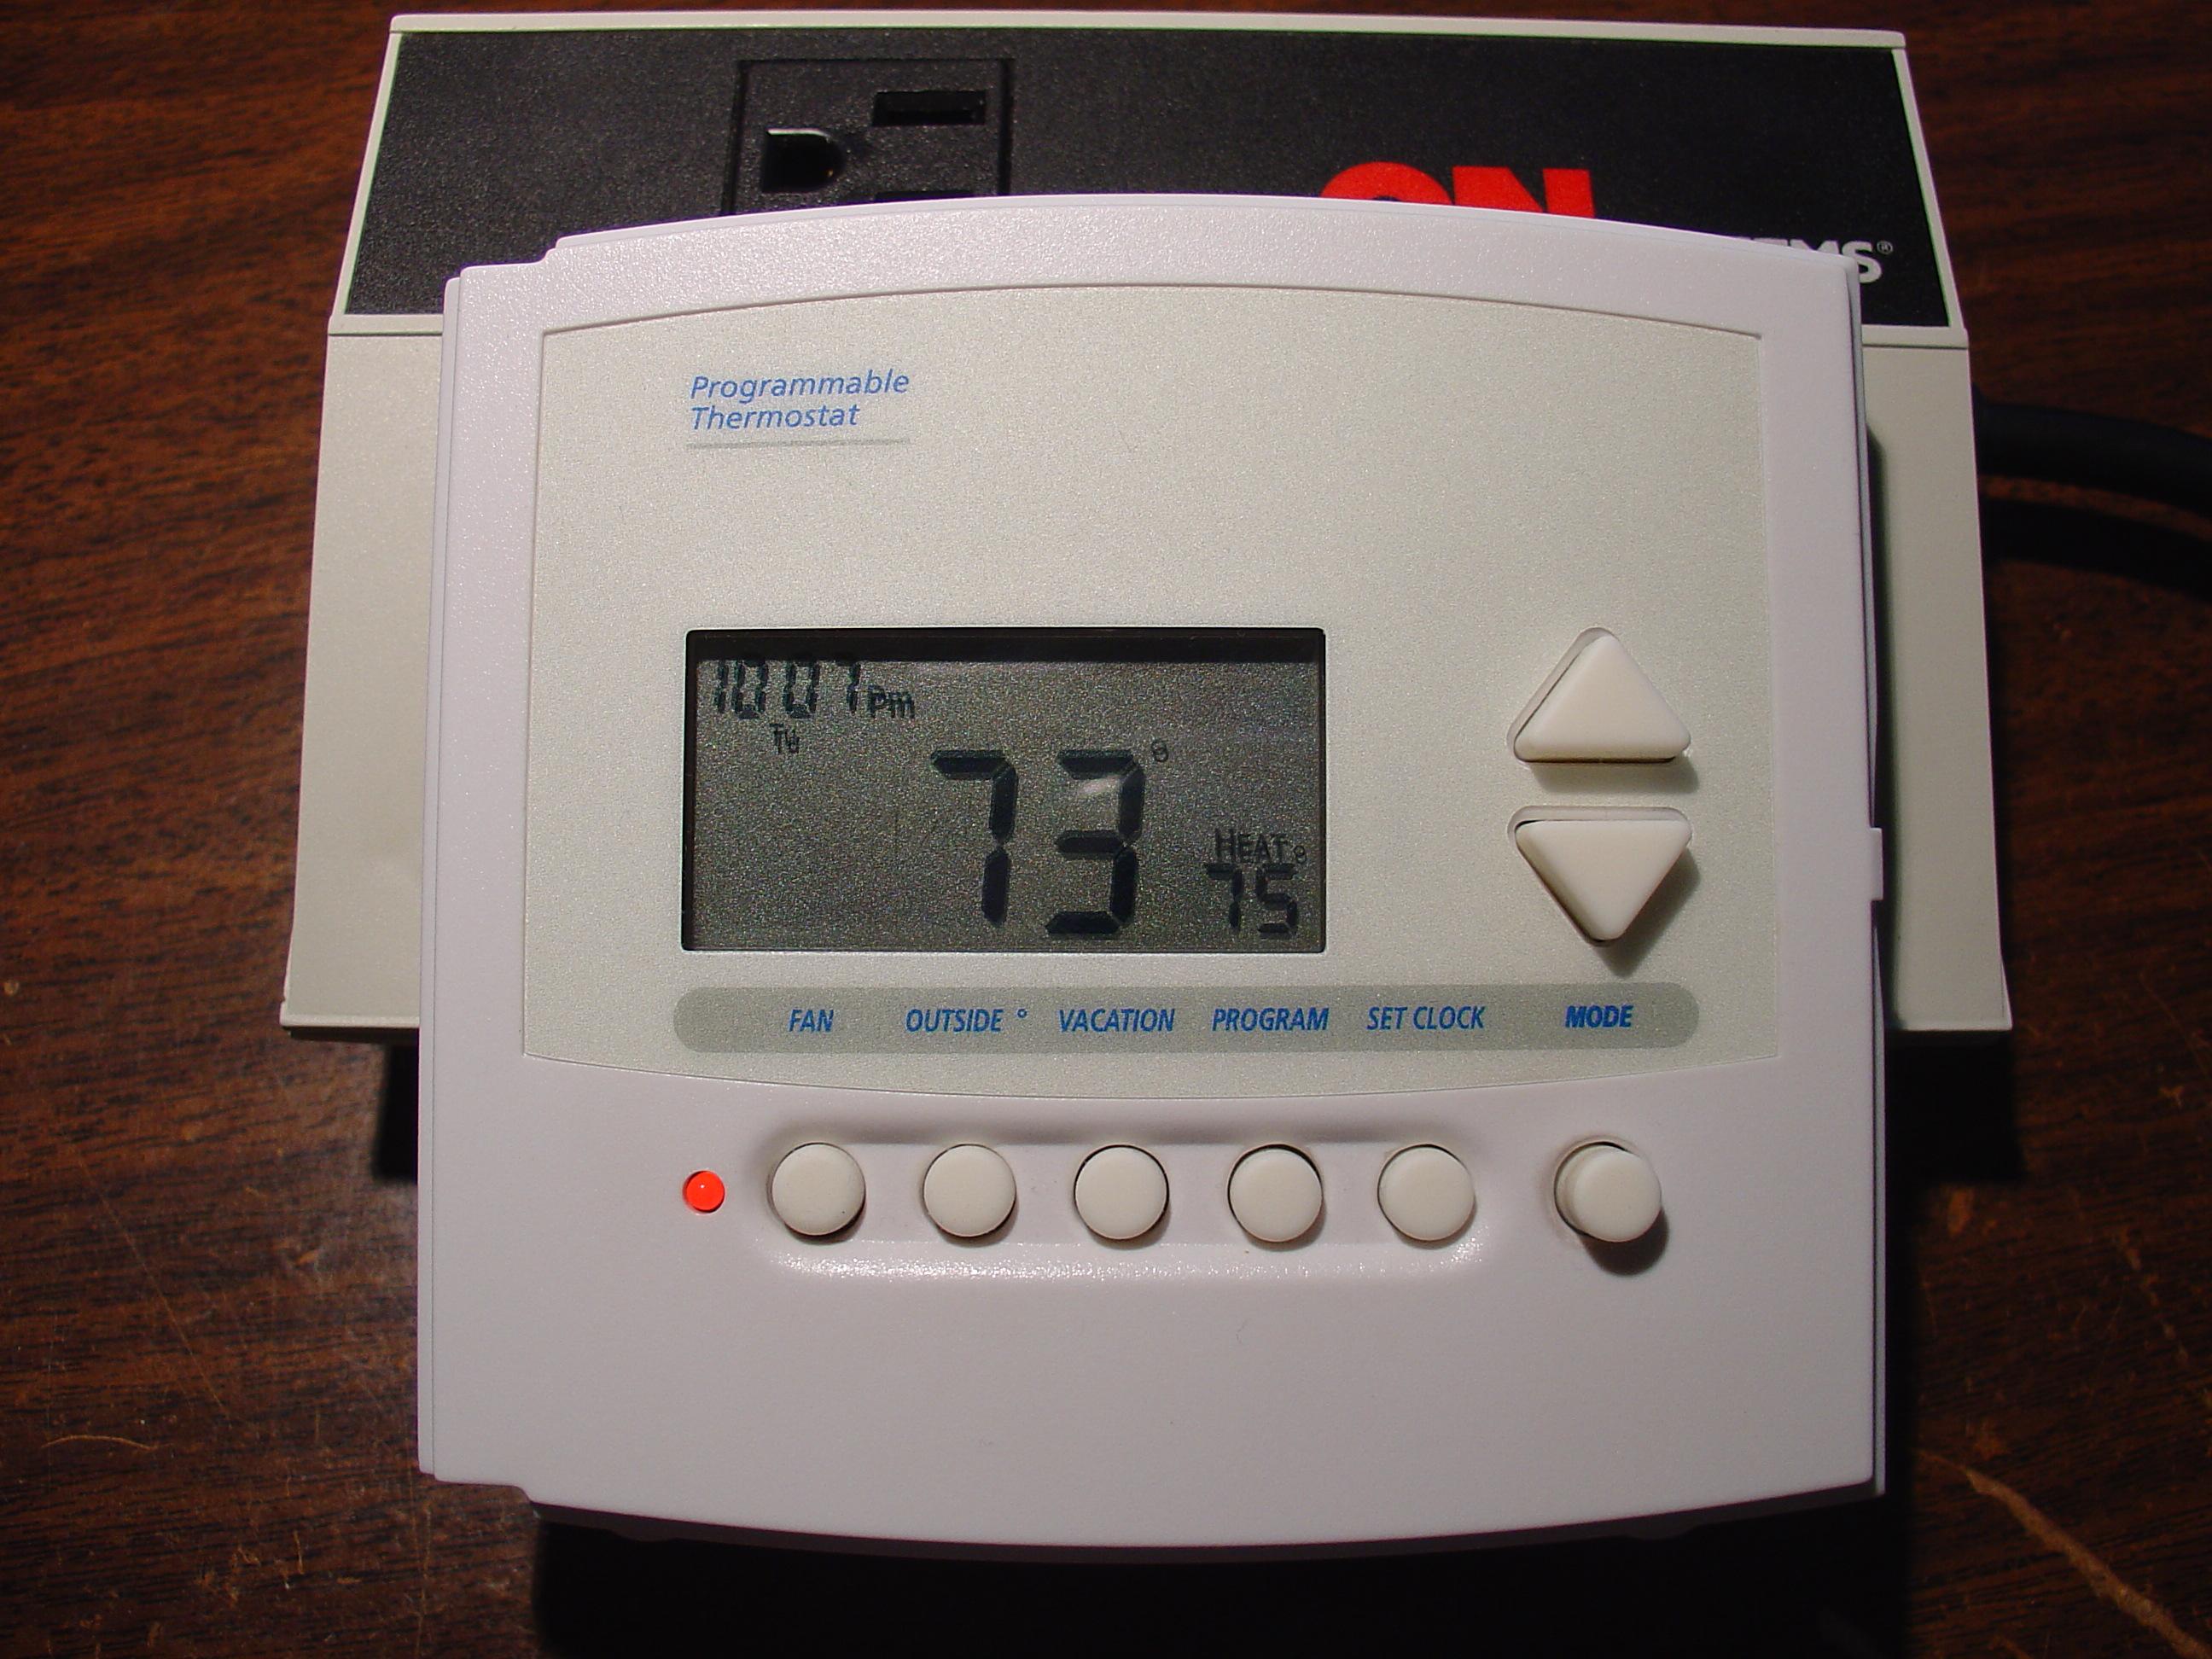 Gambar Hvac Produk Teknologi Peralatan Elektronik Perangkat